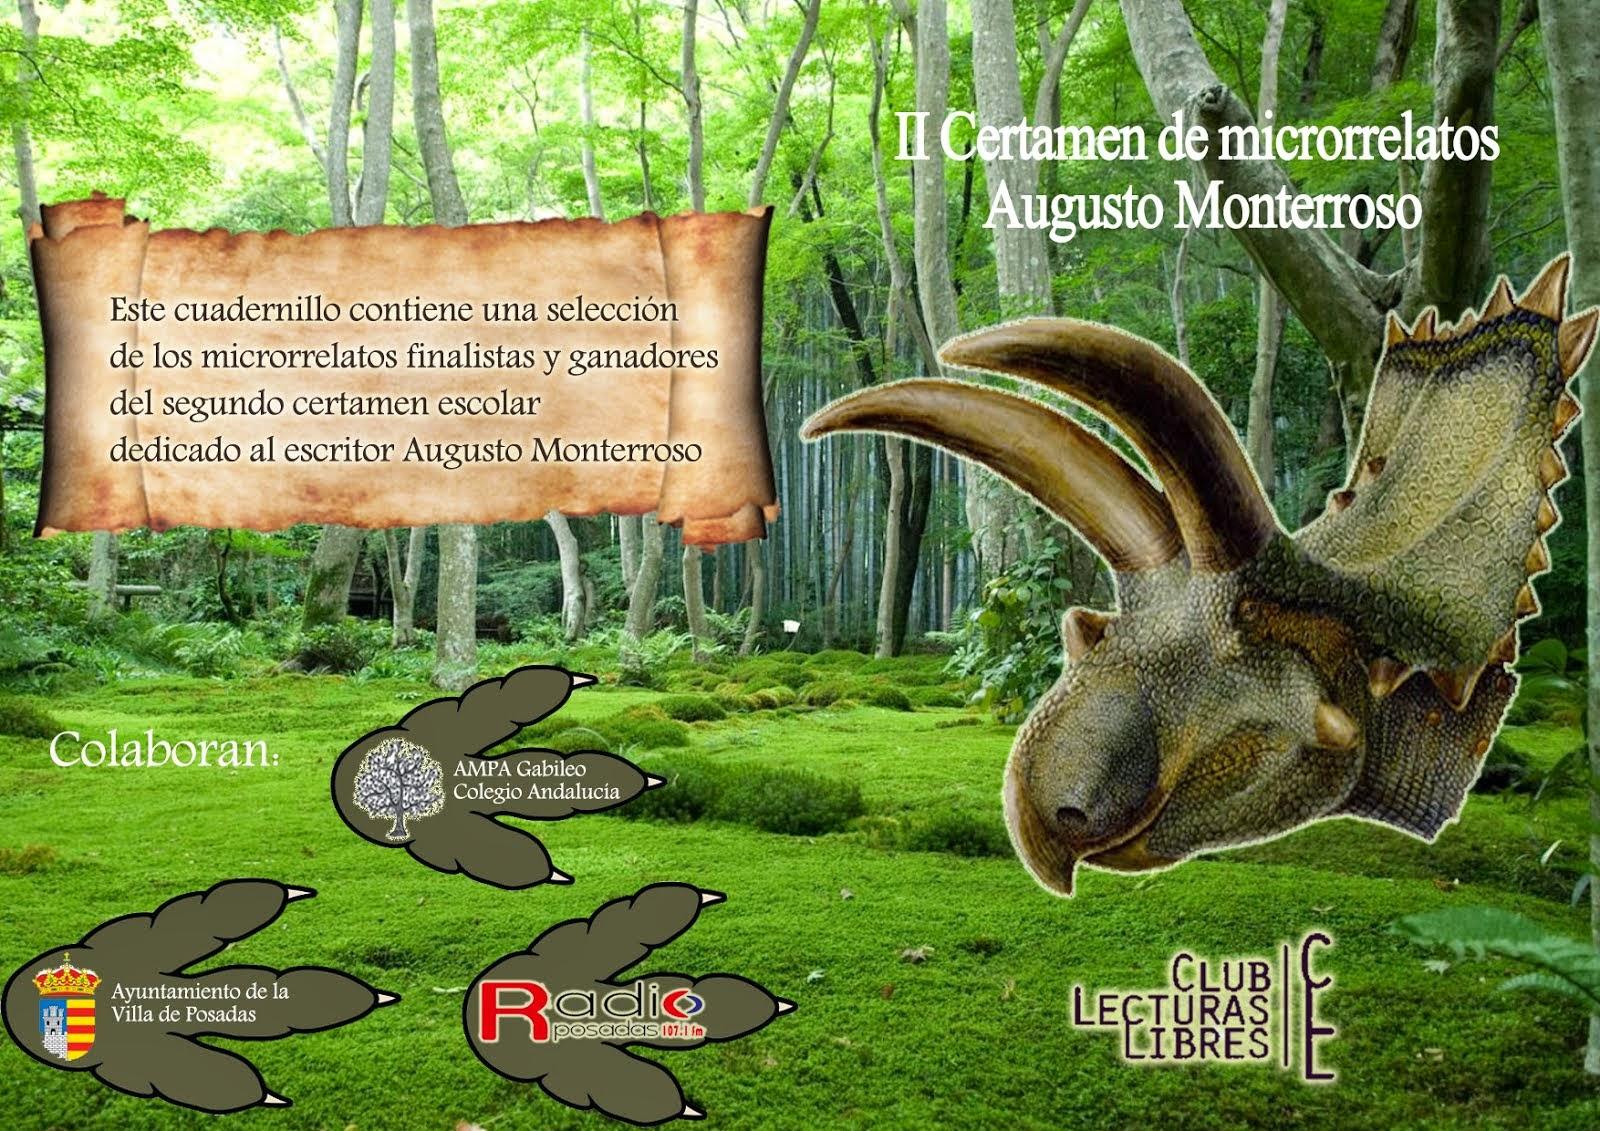 II Certamen de microrrelatos Augusto Monterroso